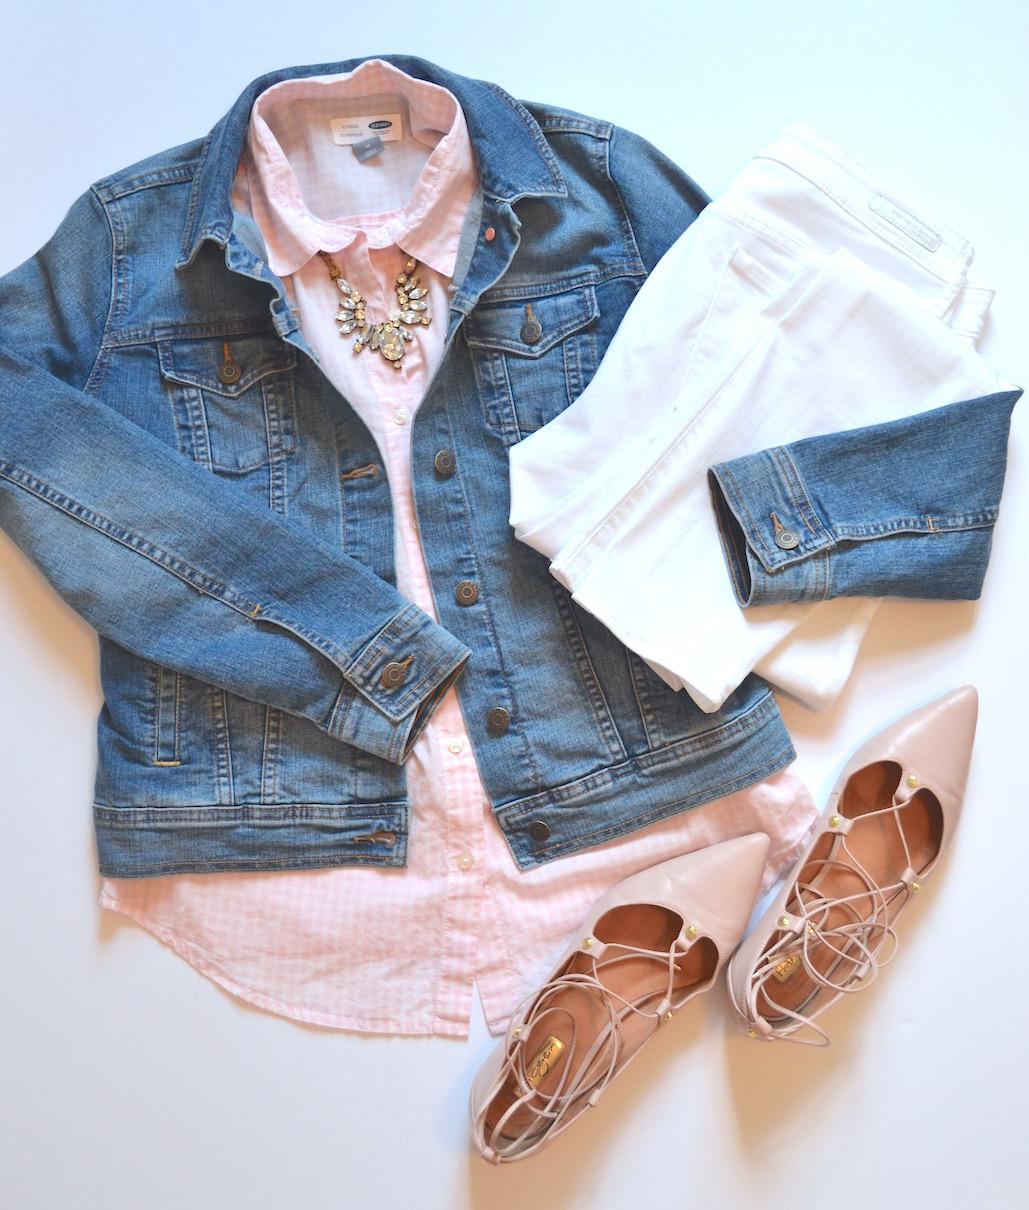 4 ways to wear white jeans 1